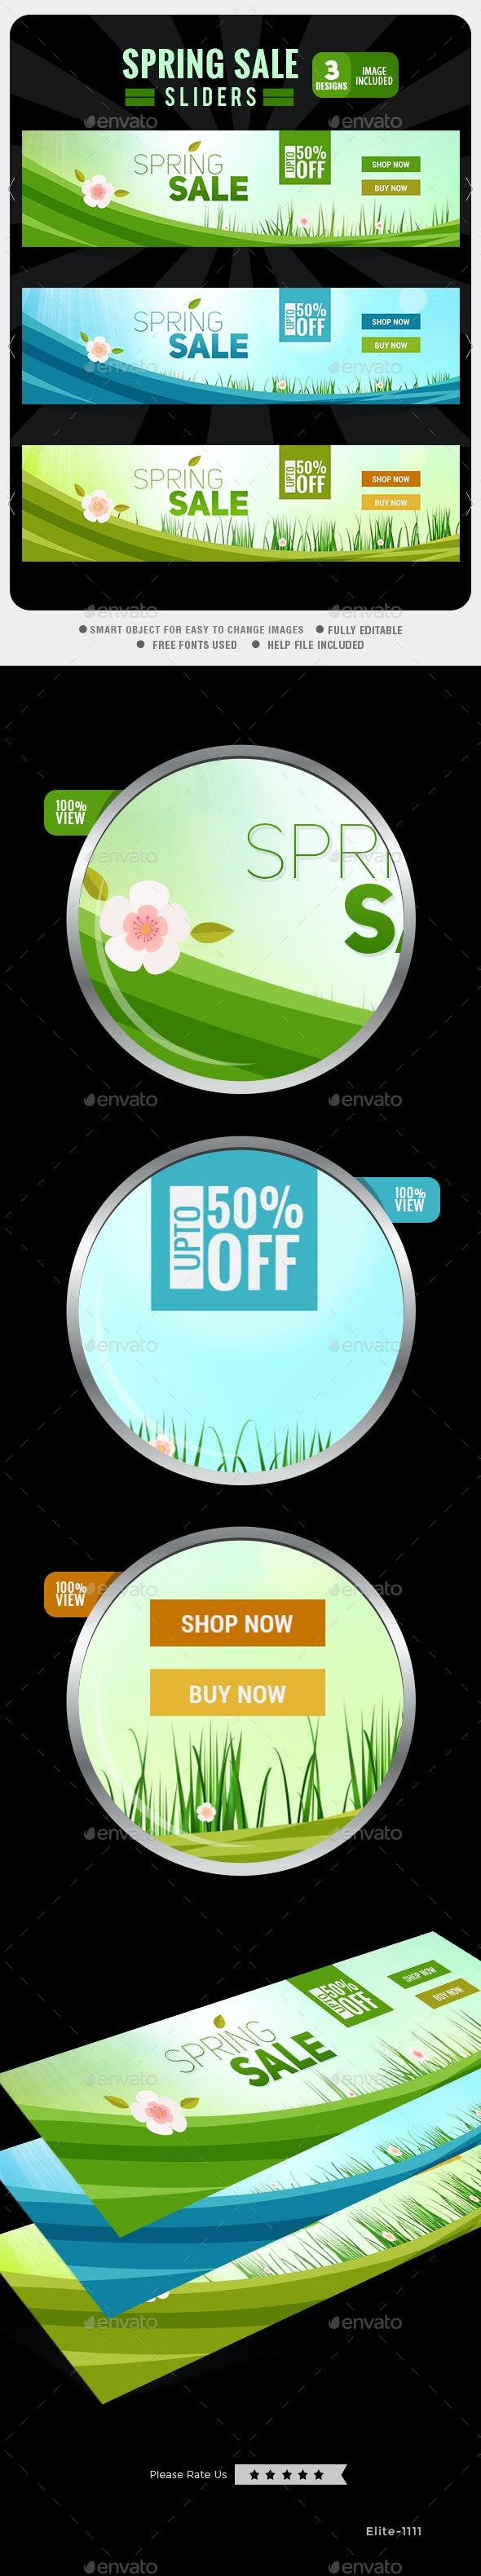 Spring Sale Slider - Sliders & Features Web Elements